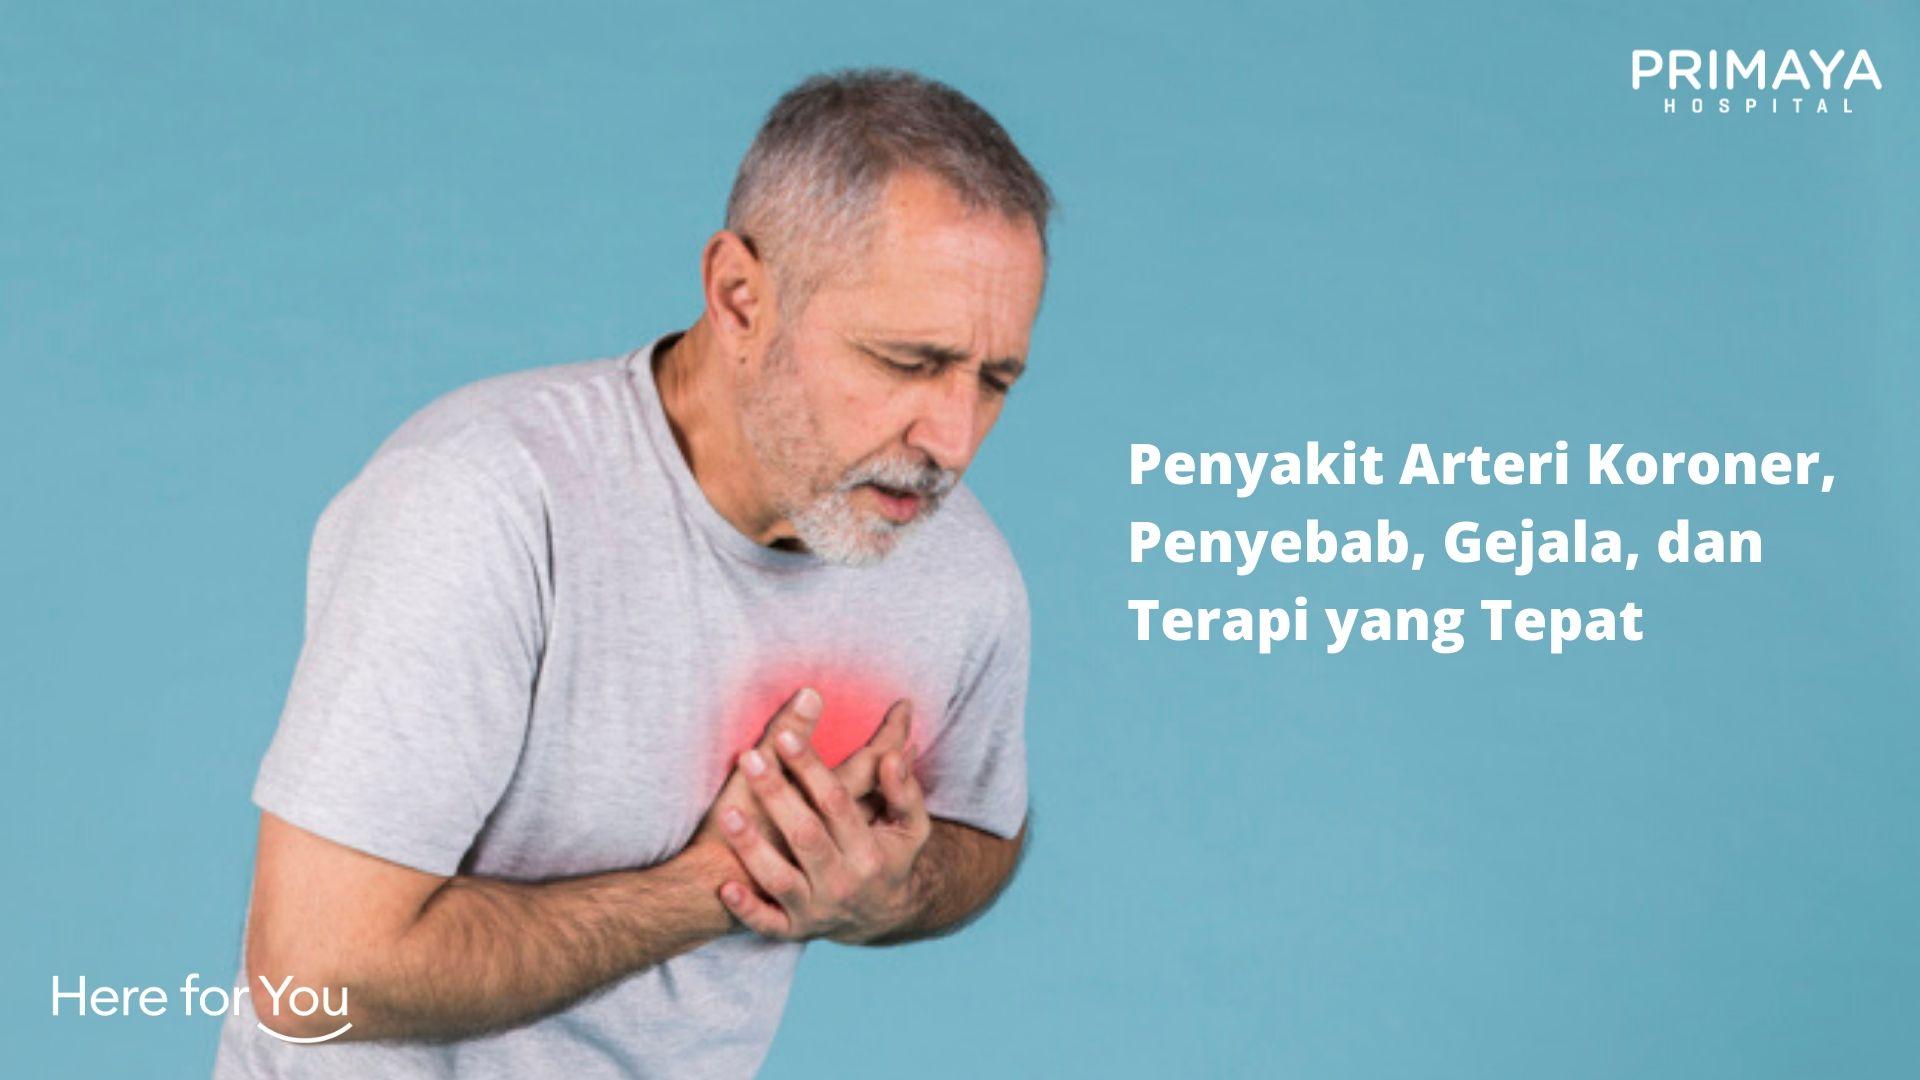 Penyakit Arteri Koroner, Penyebab, Gejala, dan Terapi yang Tepat